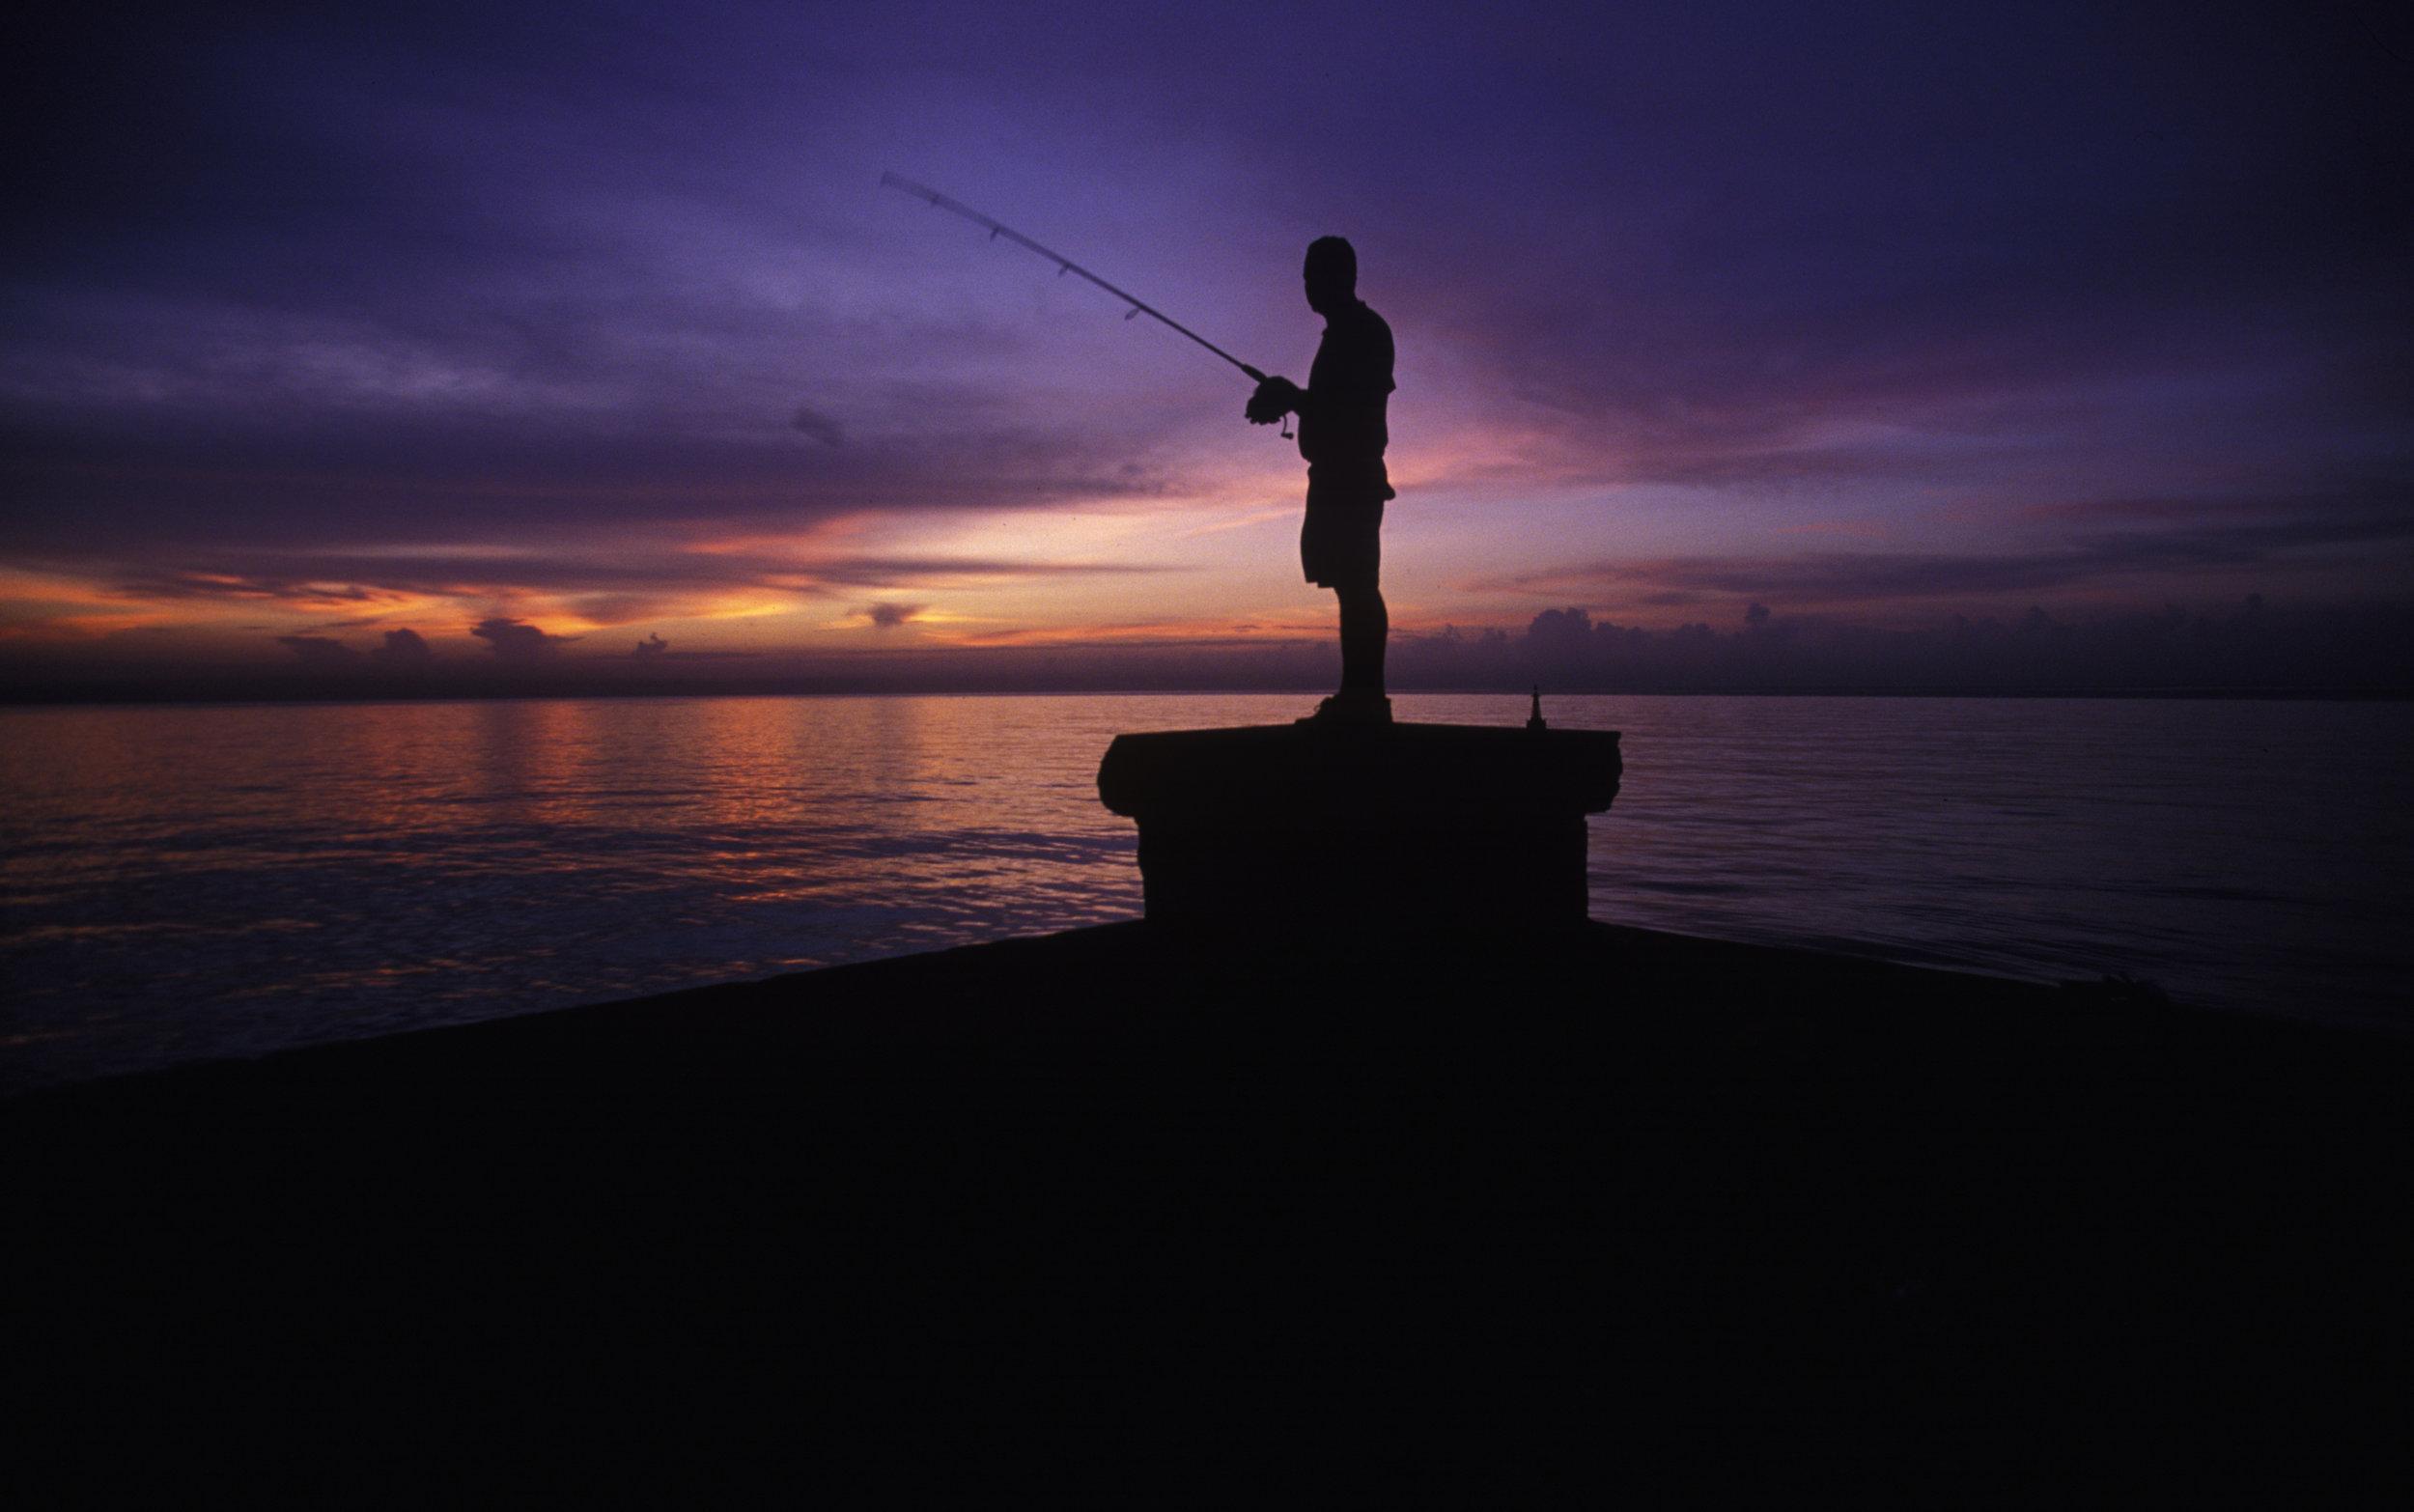 Fisherman. Havana, Cuba.